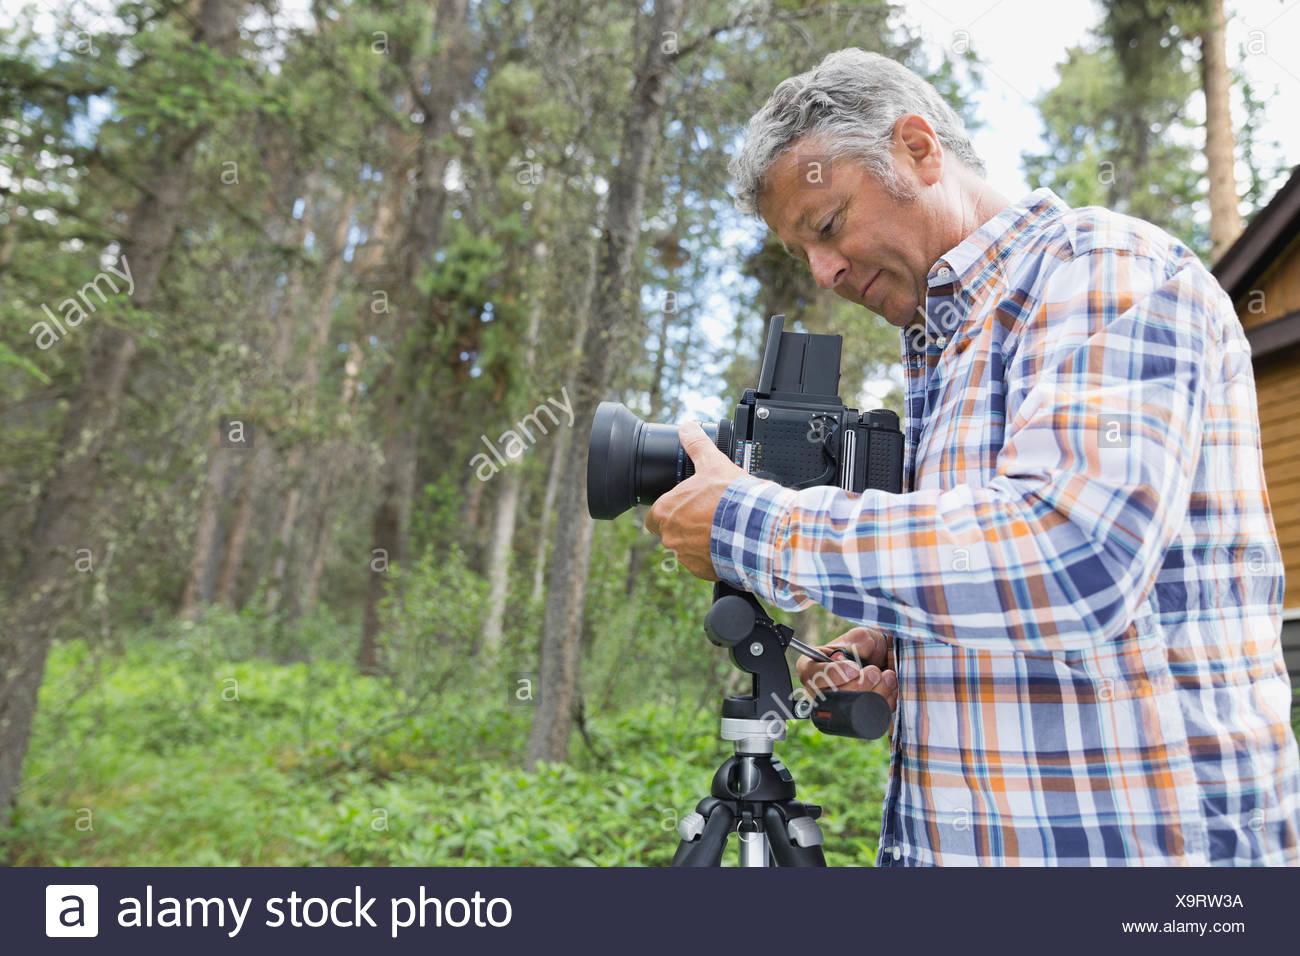 Man adjusting lens of SLR camera in yard - Stock Image